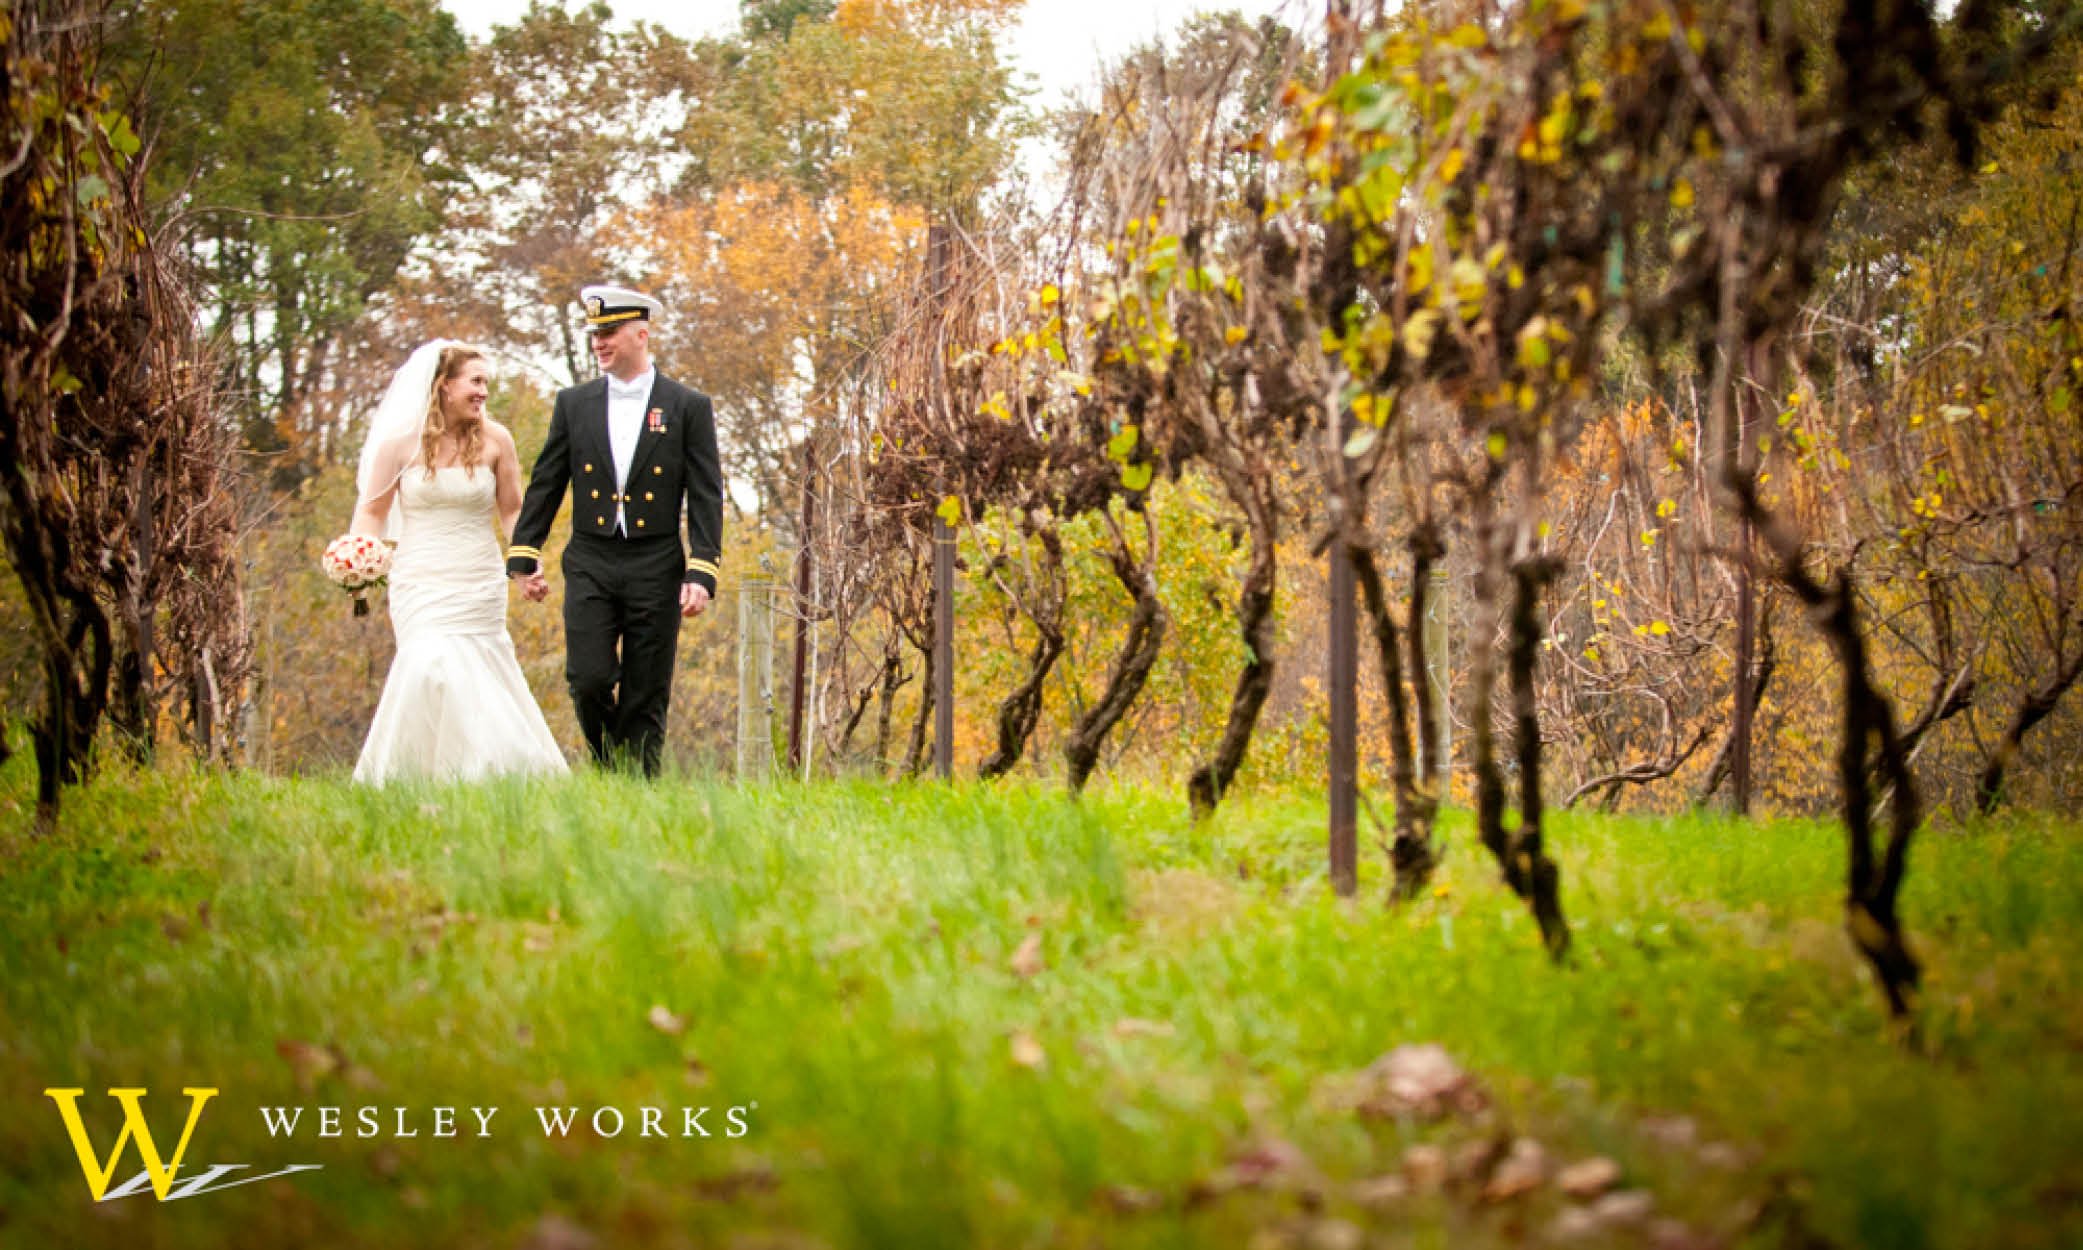 Lehigh Valley Wedding and Reception Sites | Wesley Works | DJ ...